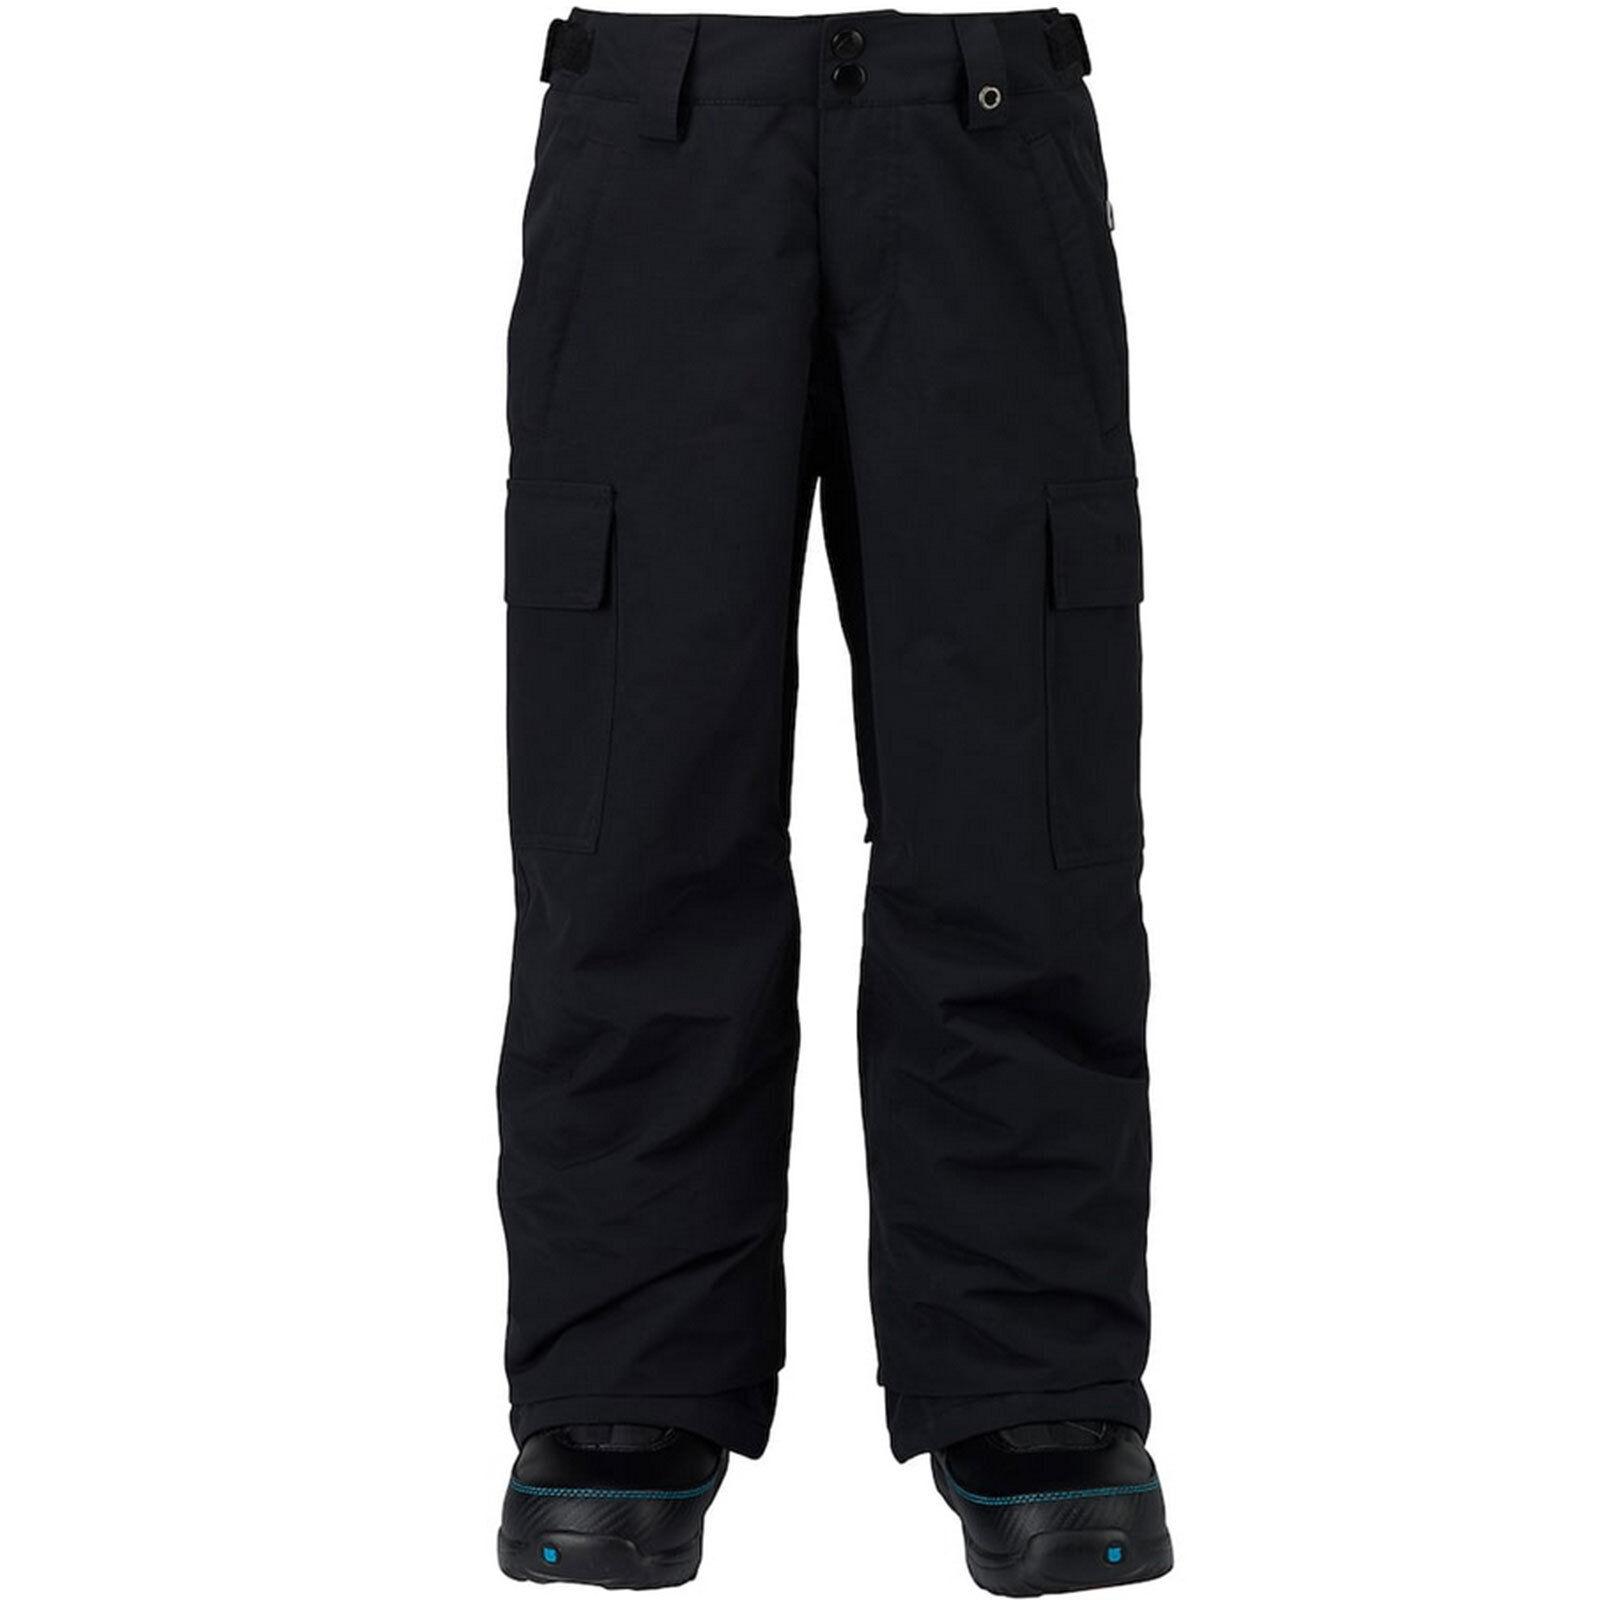 Burton Boys Exile Cargo Pant Bambini Pantaloni da Snowboard Snowboard Snowboard Sci Termici 83d23b